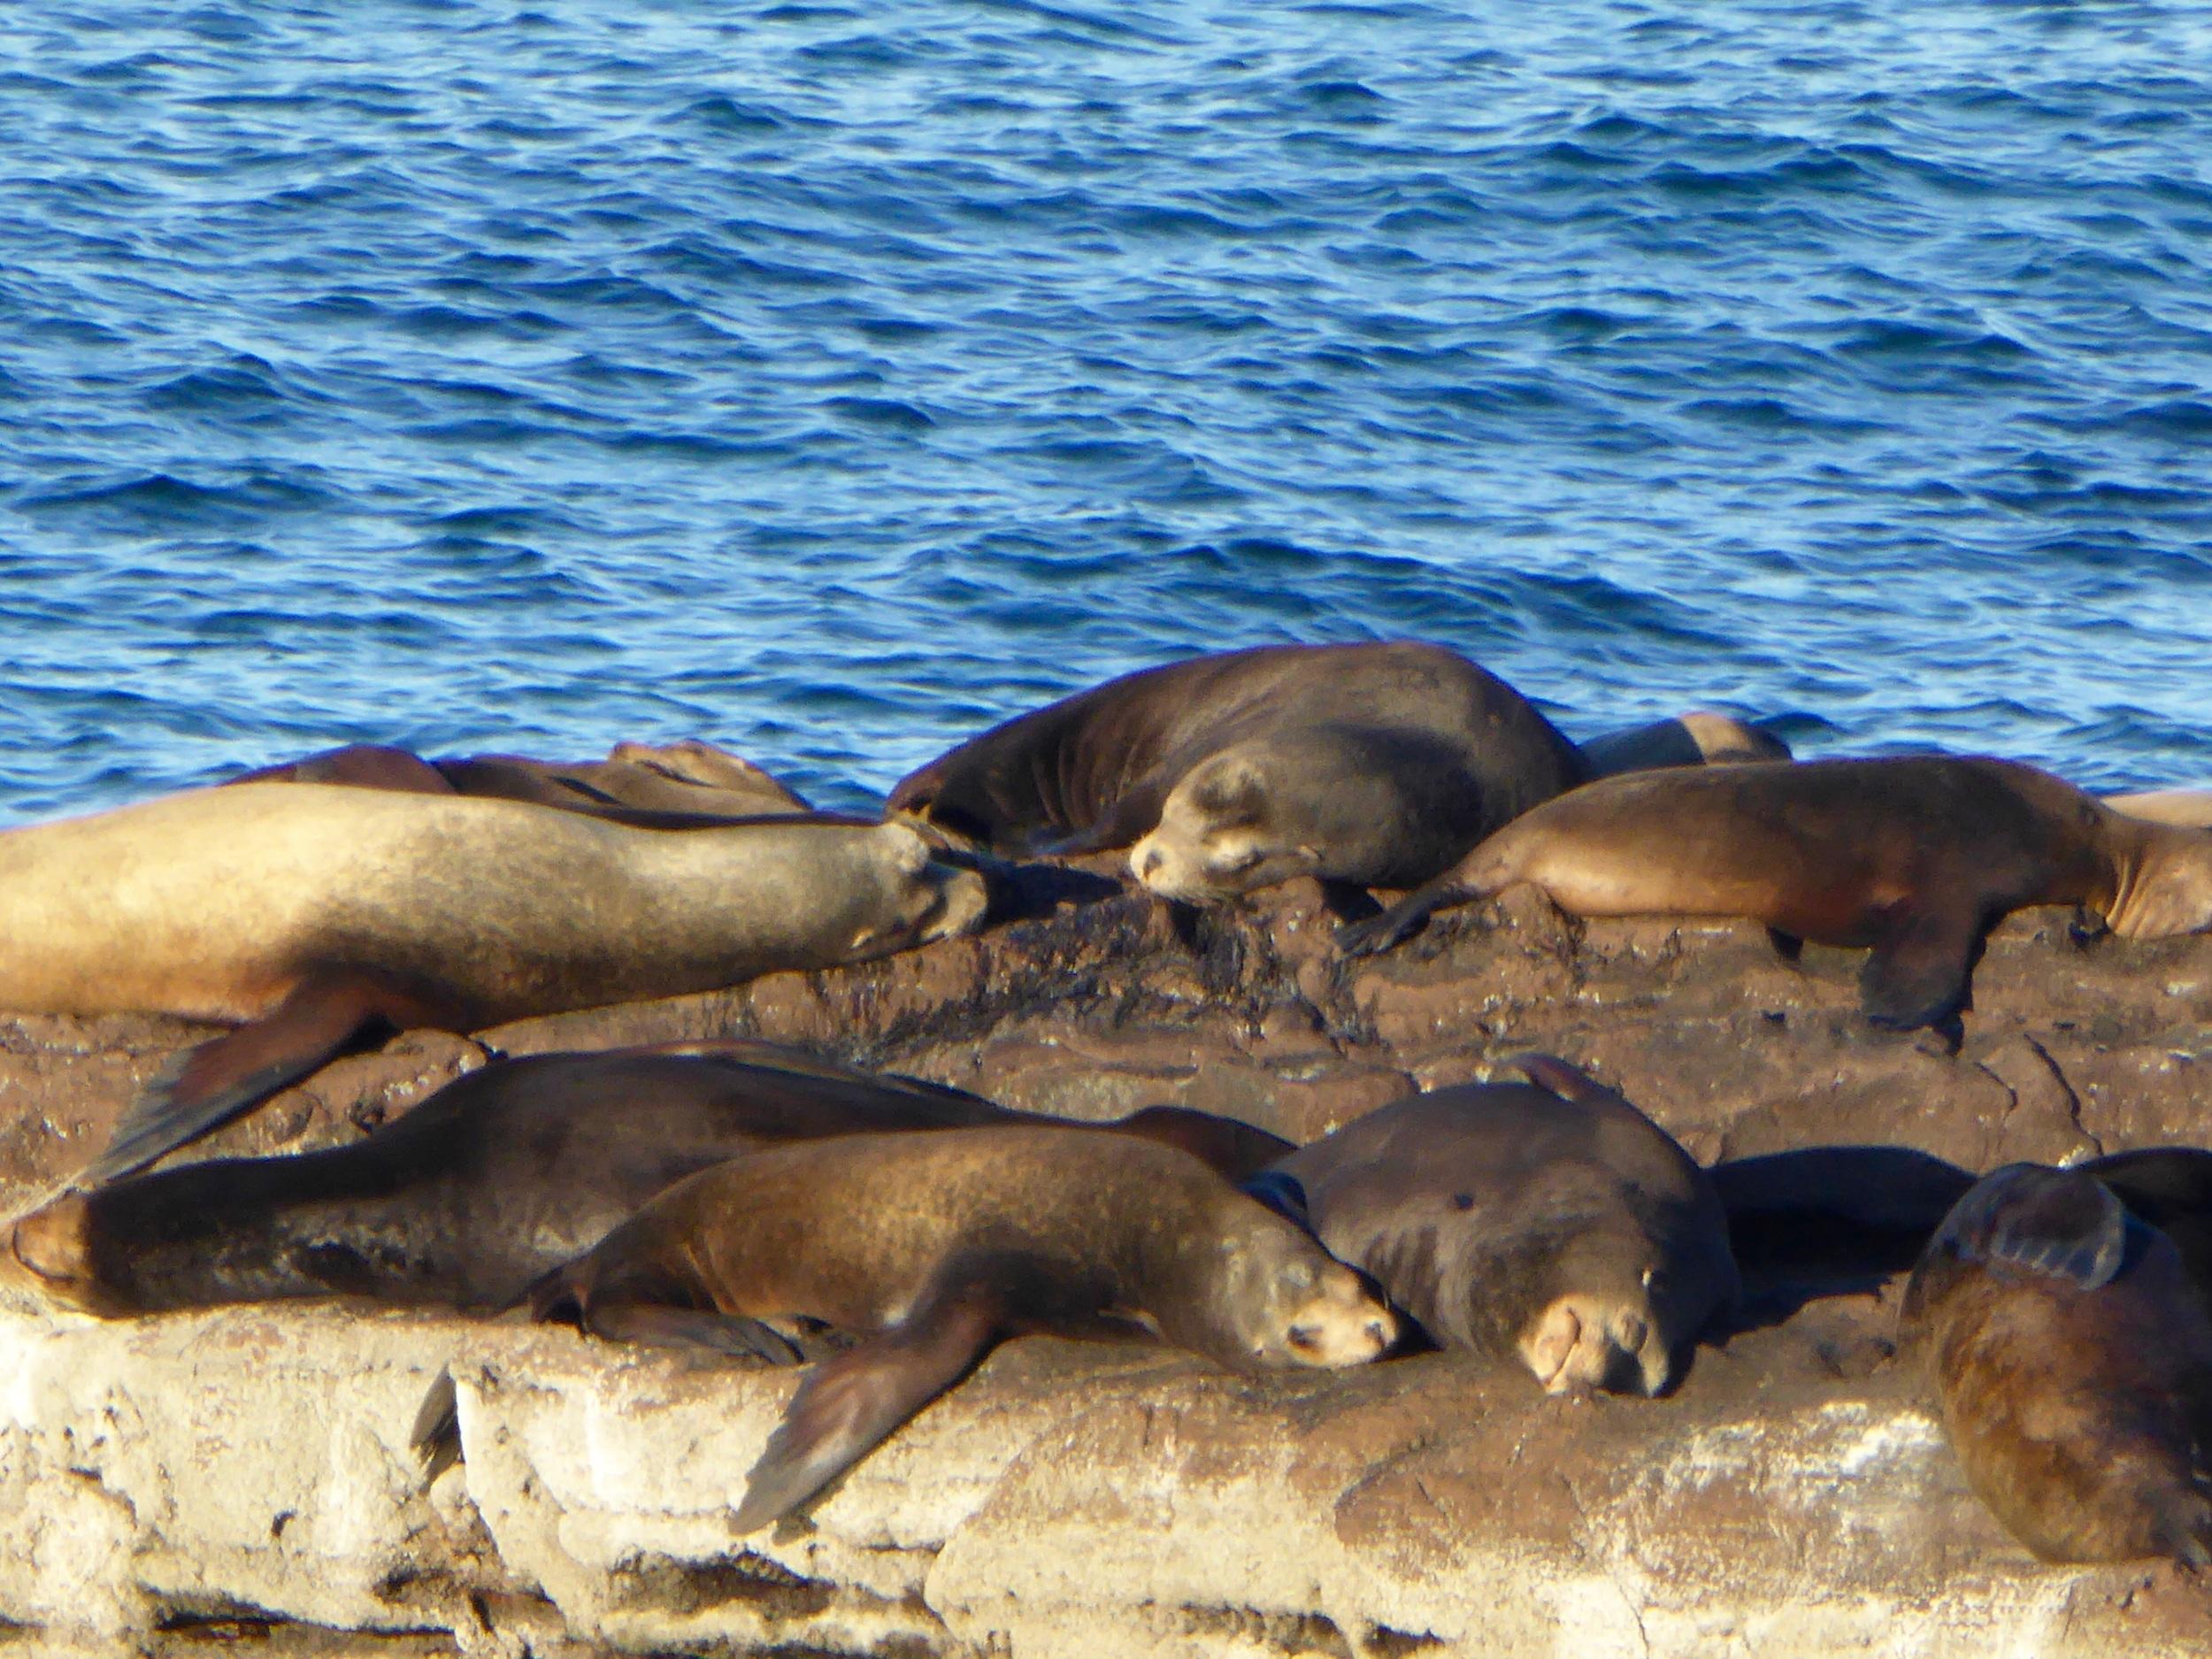 Ca. Sea Lions enjoying the sun